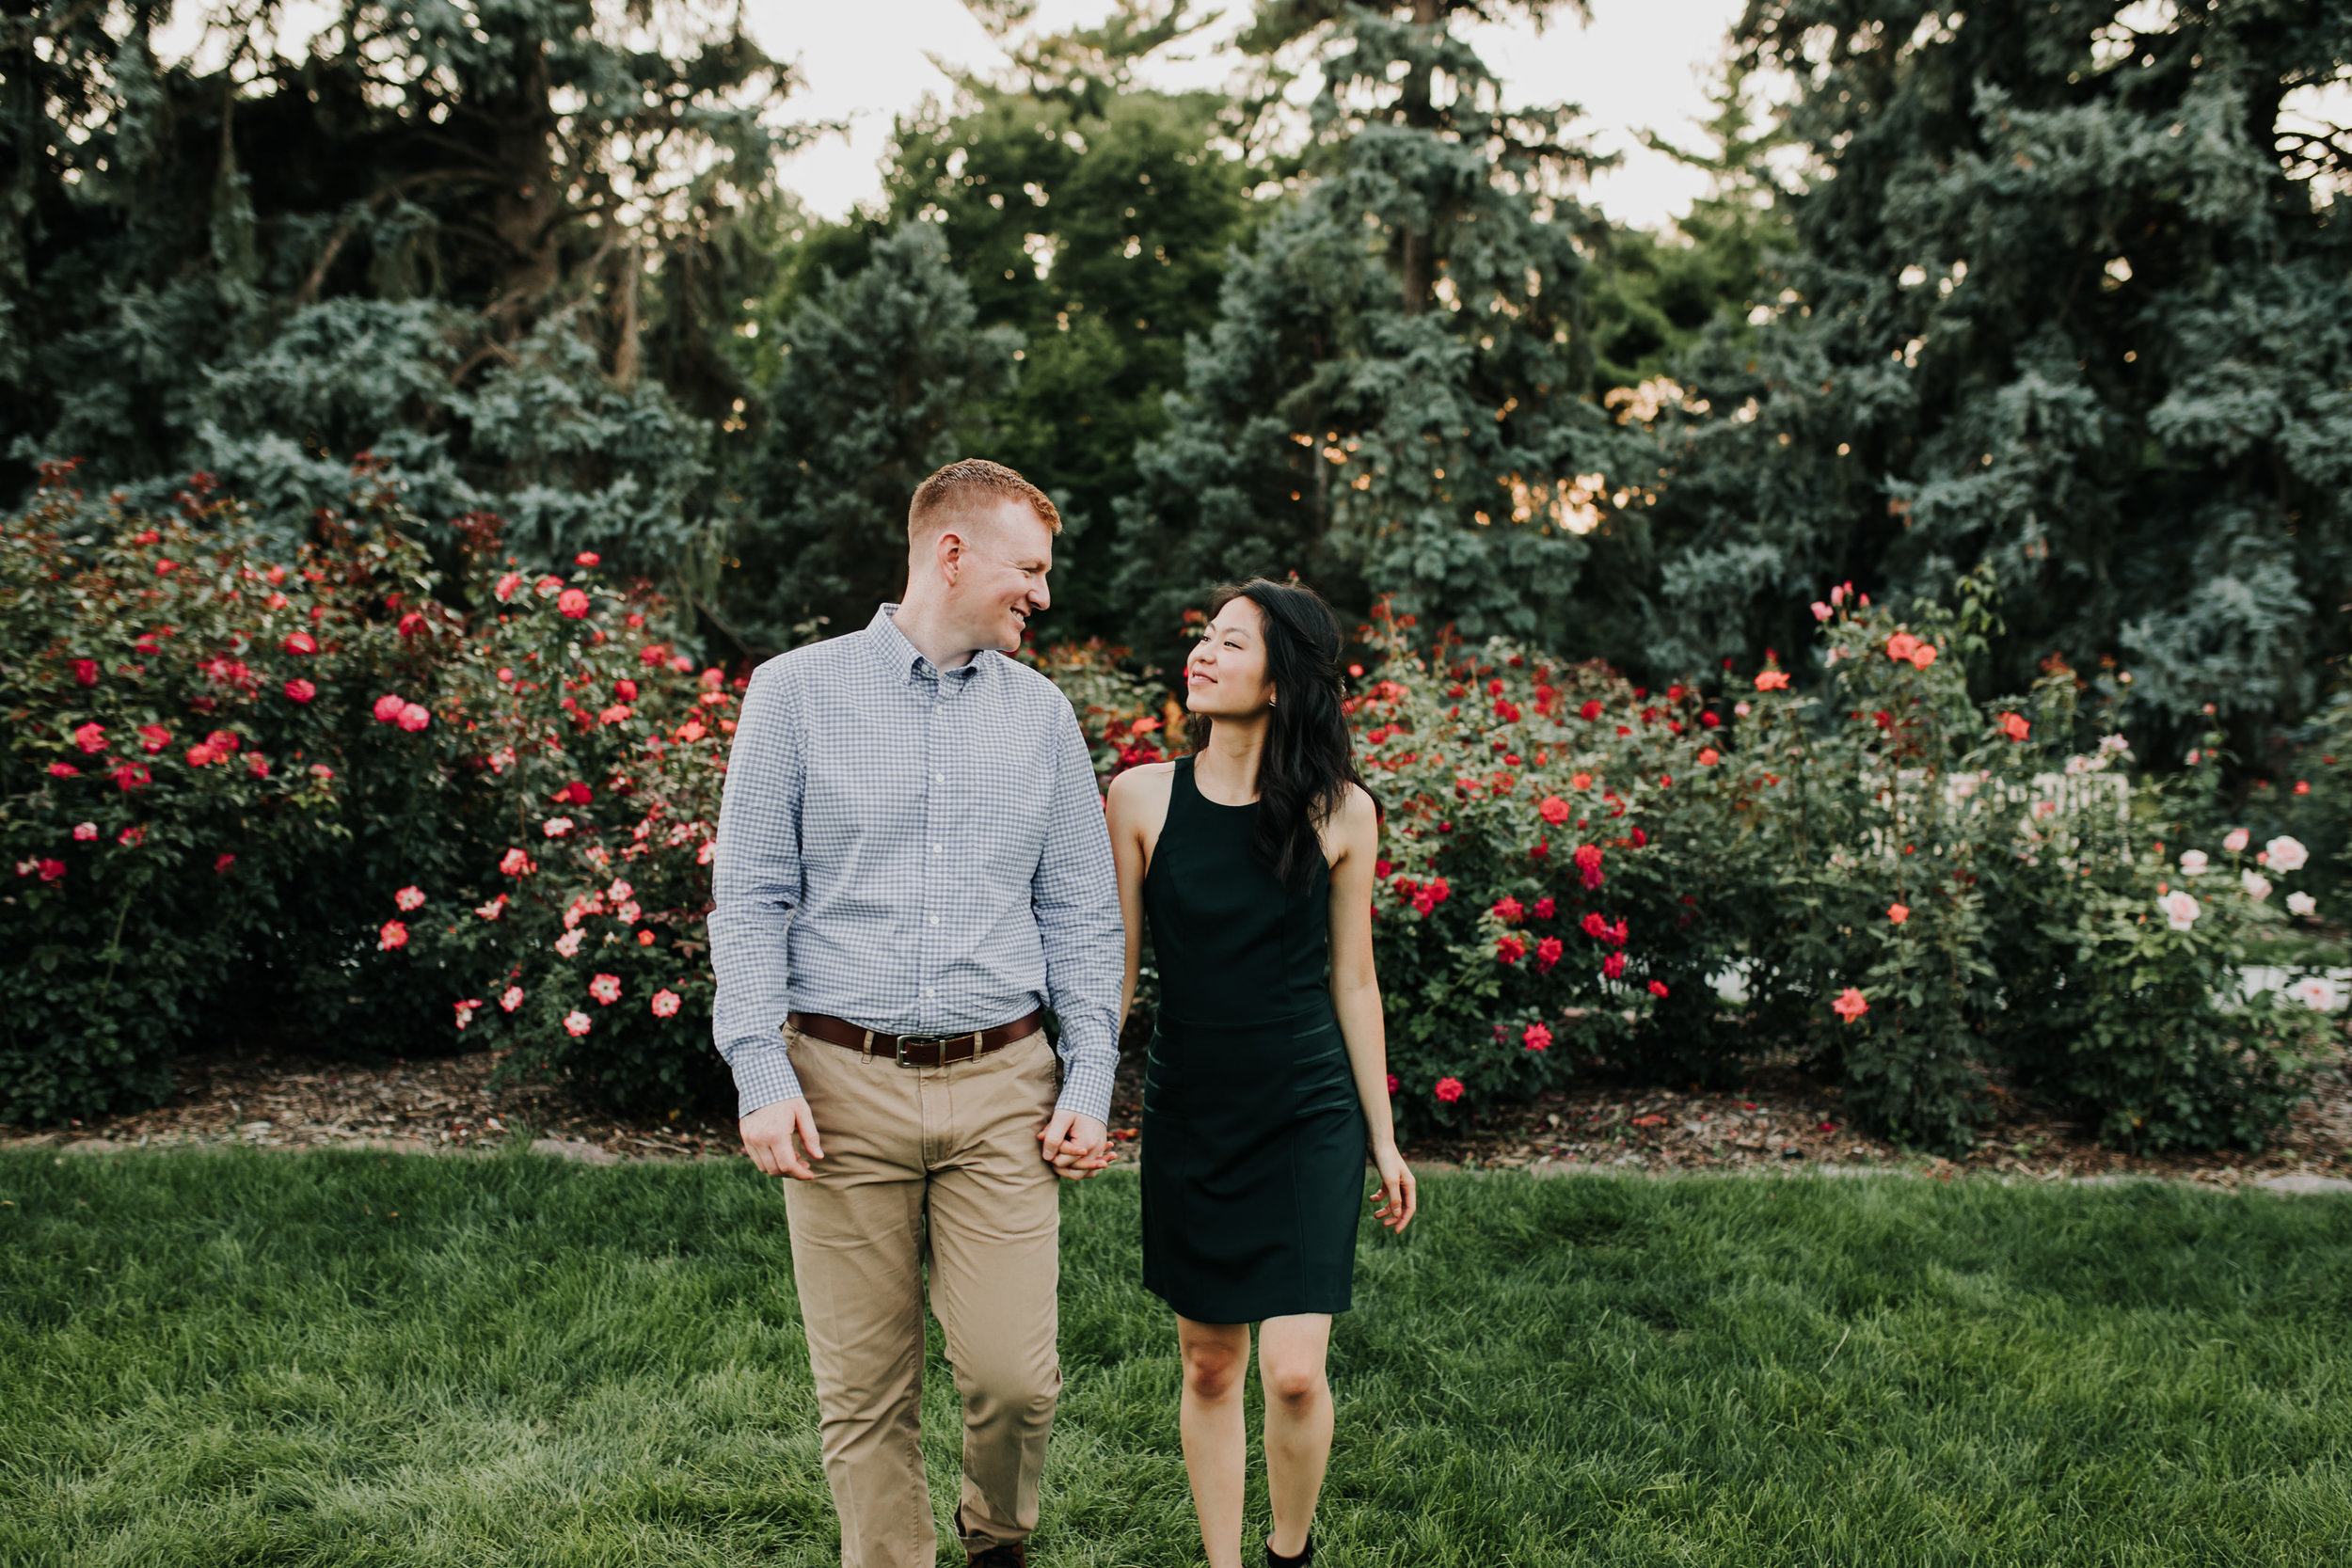 Catherin & Kyle - Married - Nathaniel Jensen Photography - Omaha Nebraska Wedding Photograper - Memorial Park - Joslyn Castle Engagement Session-67.jpg